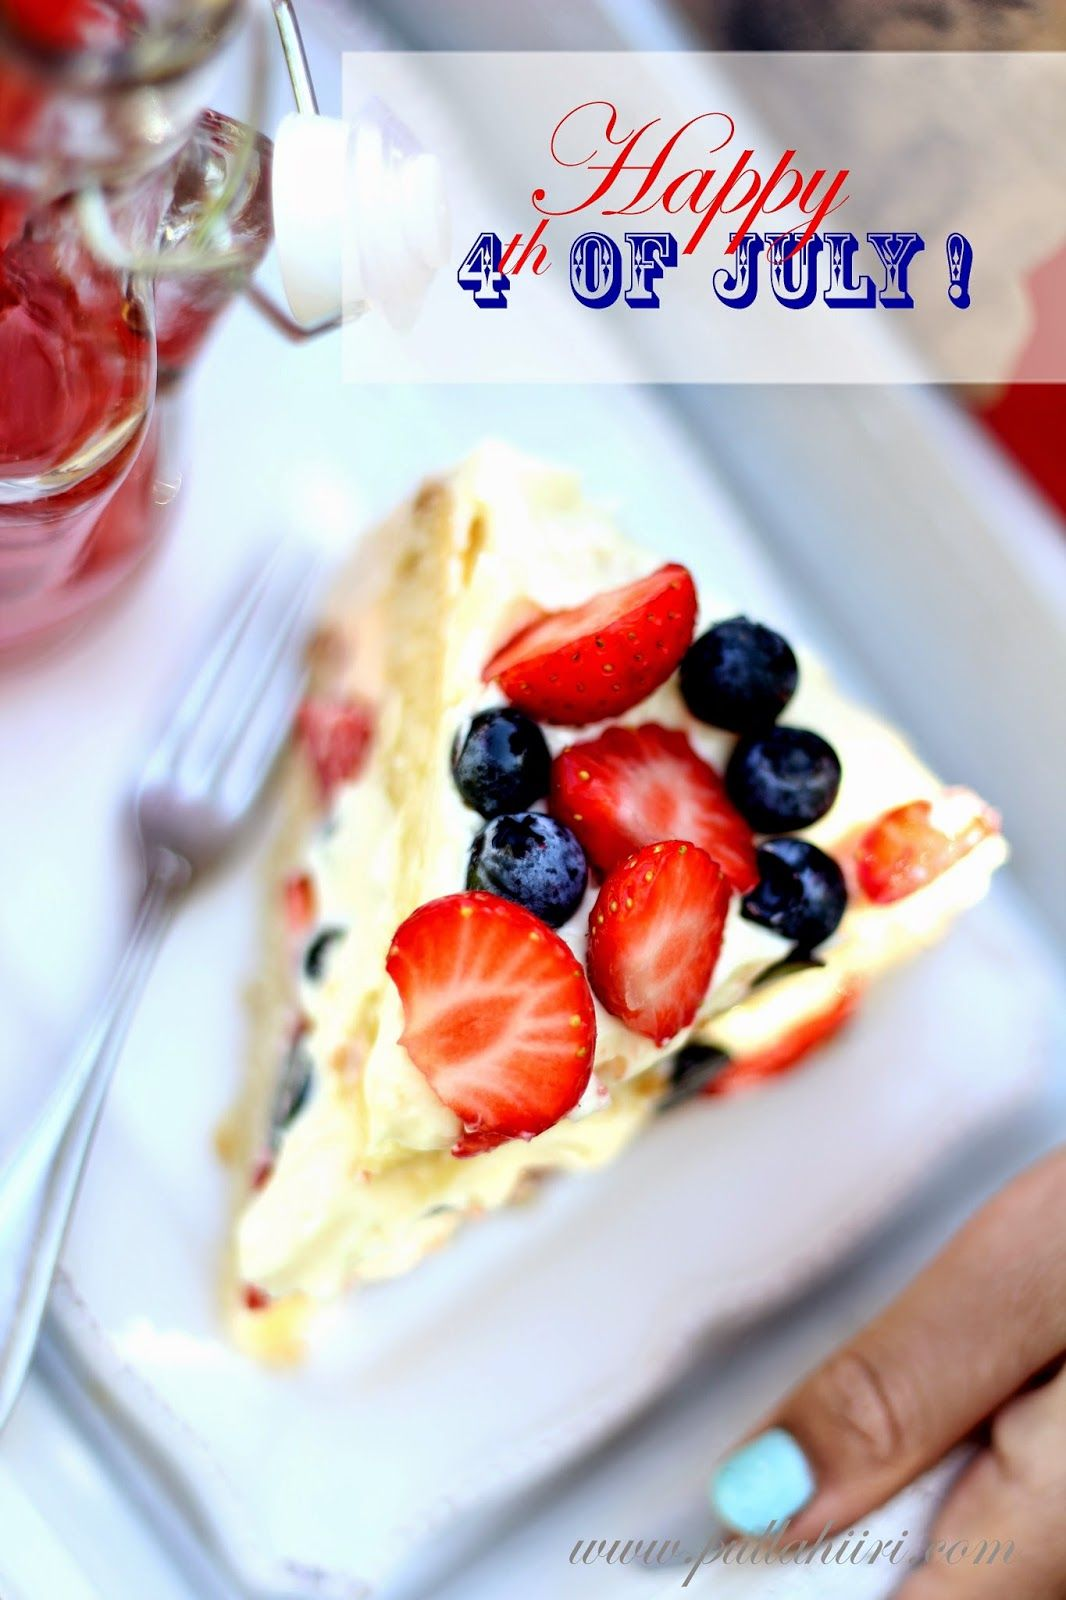 Pullahiiren leivontanurkka: Happy 4th of july - bacca meraviglioso e torta di cioccolato bianco  Happy 4th of july - Ihana marja-valkosuklaakakku